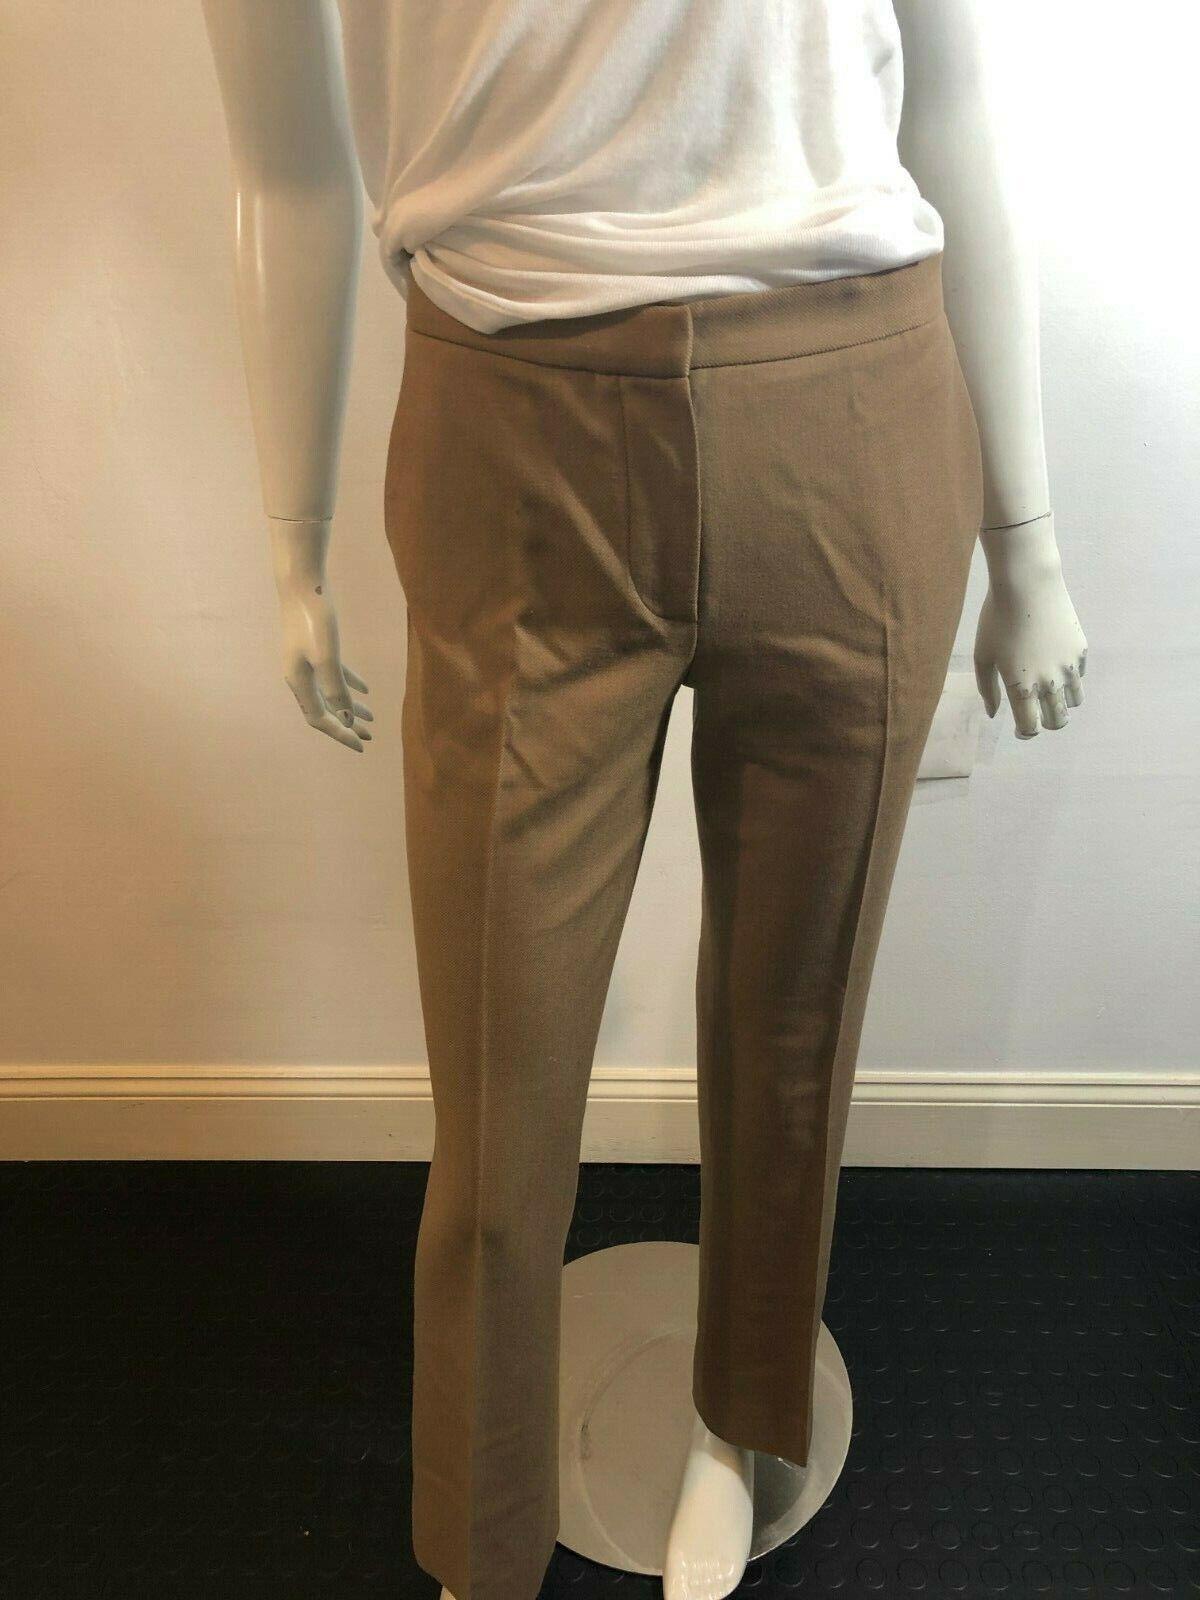 PRADA 7619 tan Marrón  Pantalones De Lana Talla 38  barato en alta calidad